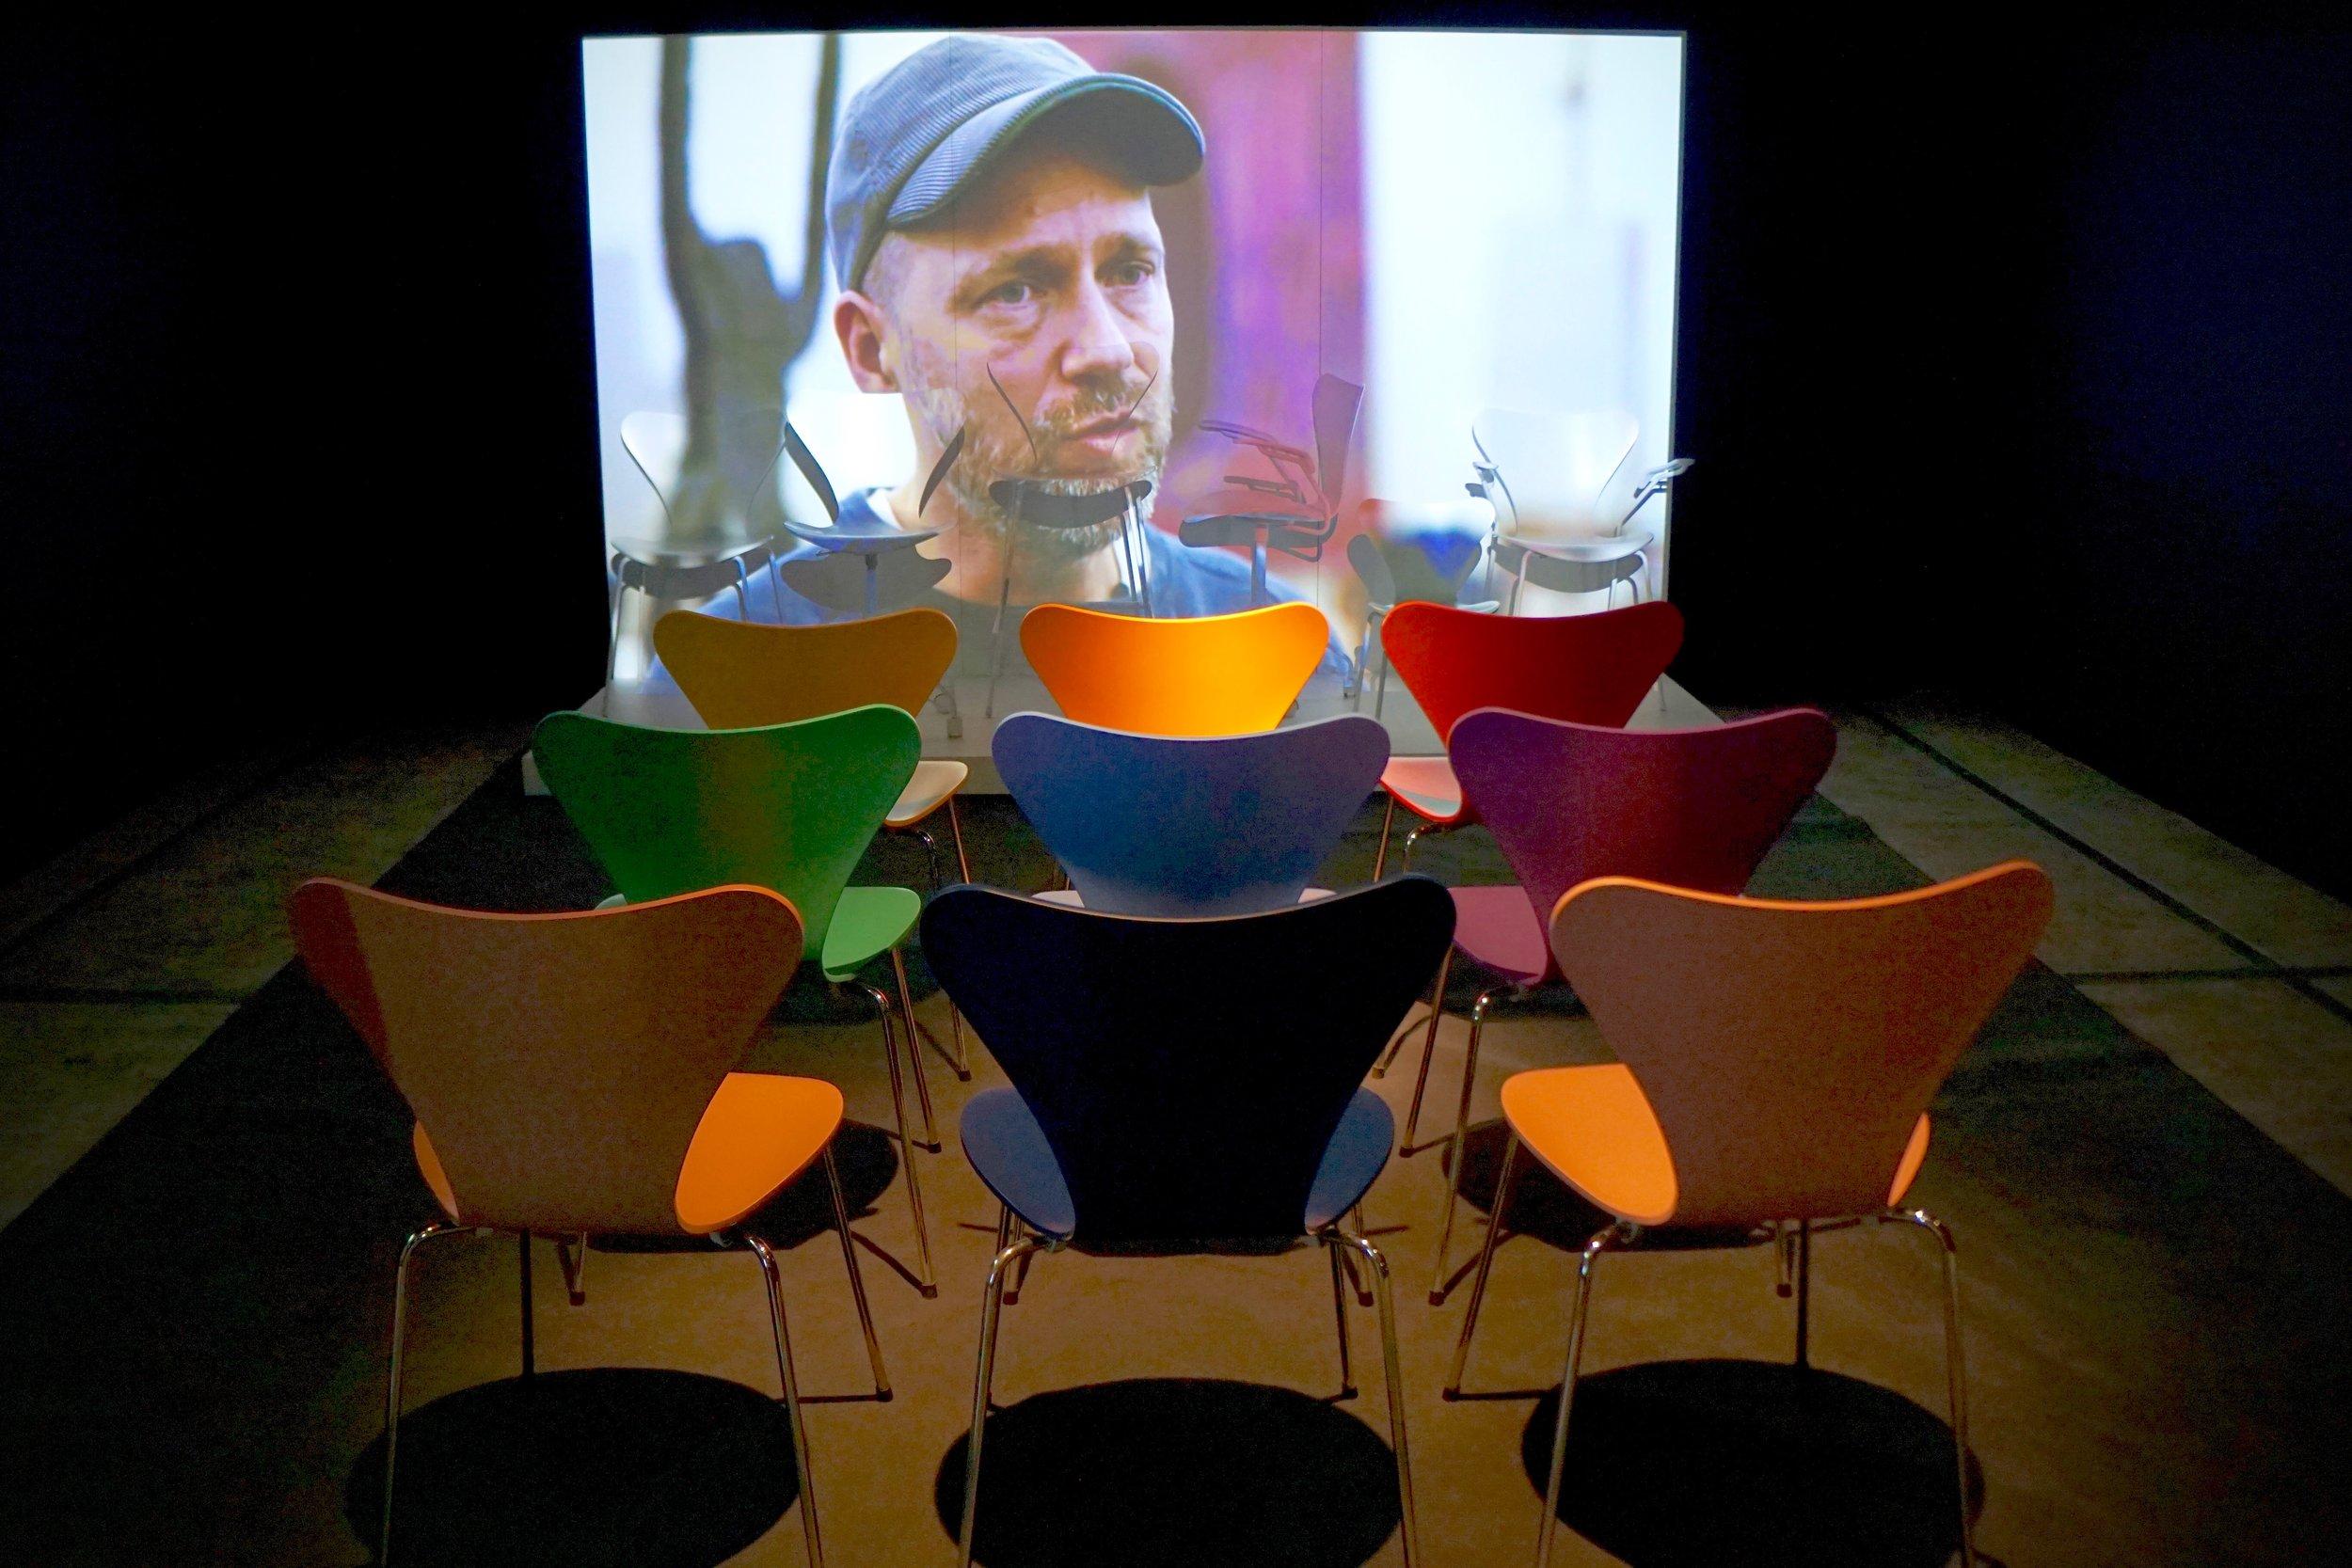 The 7 Chair Installation - originally shown at the Fritz Hansen Showroom, Milan, 2015